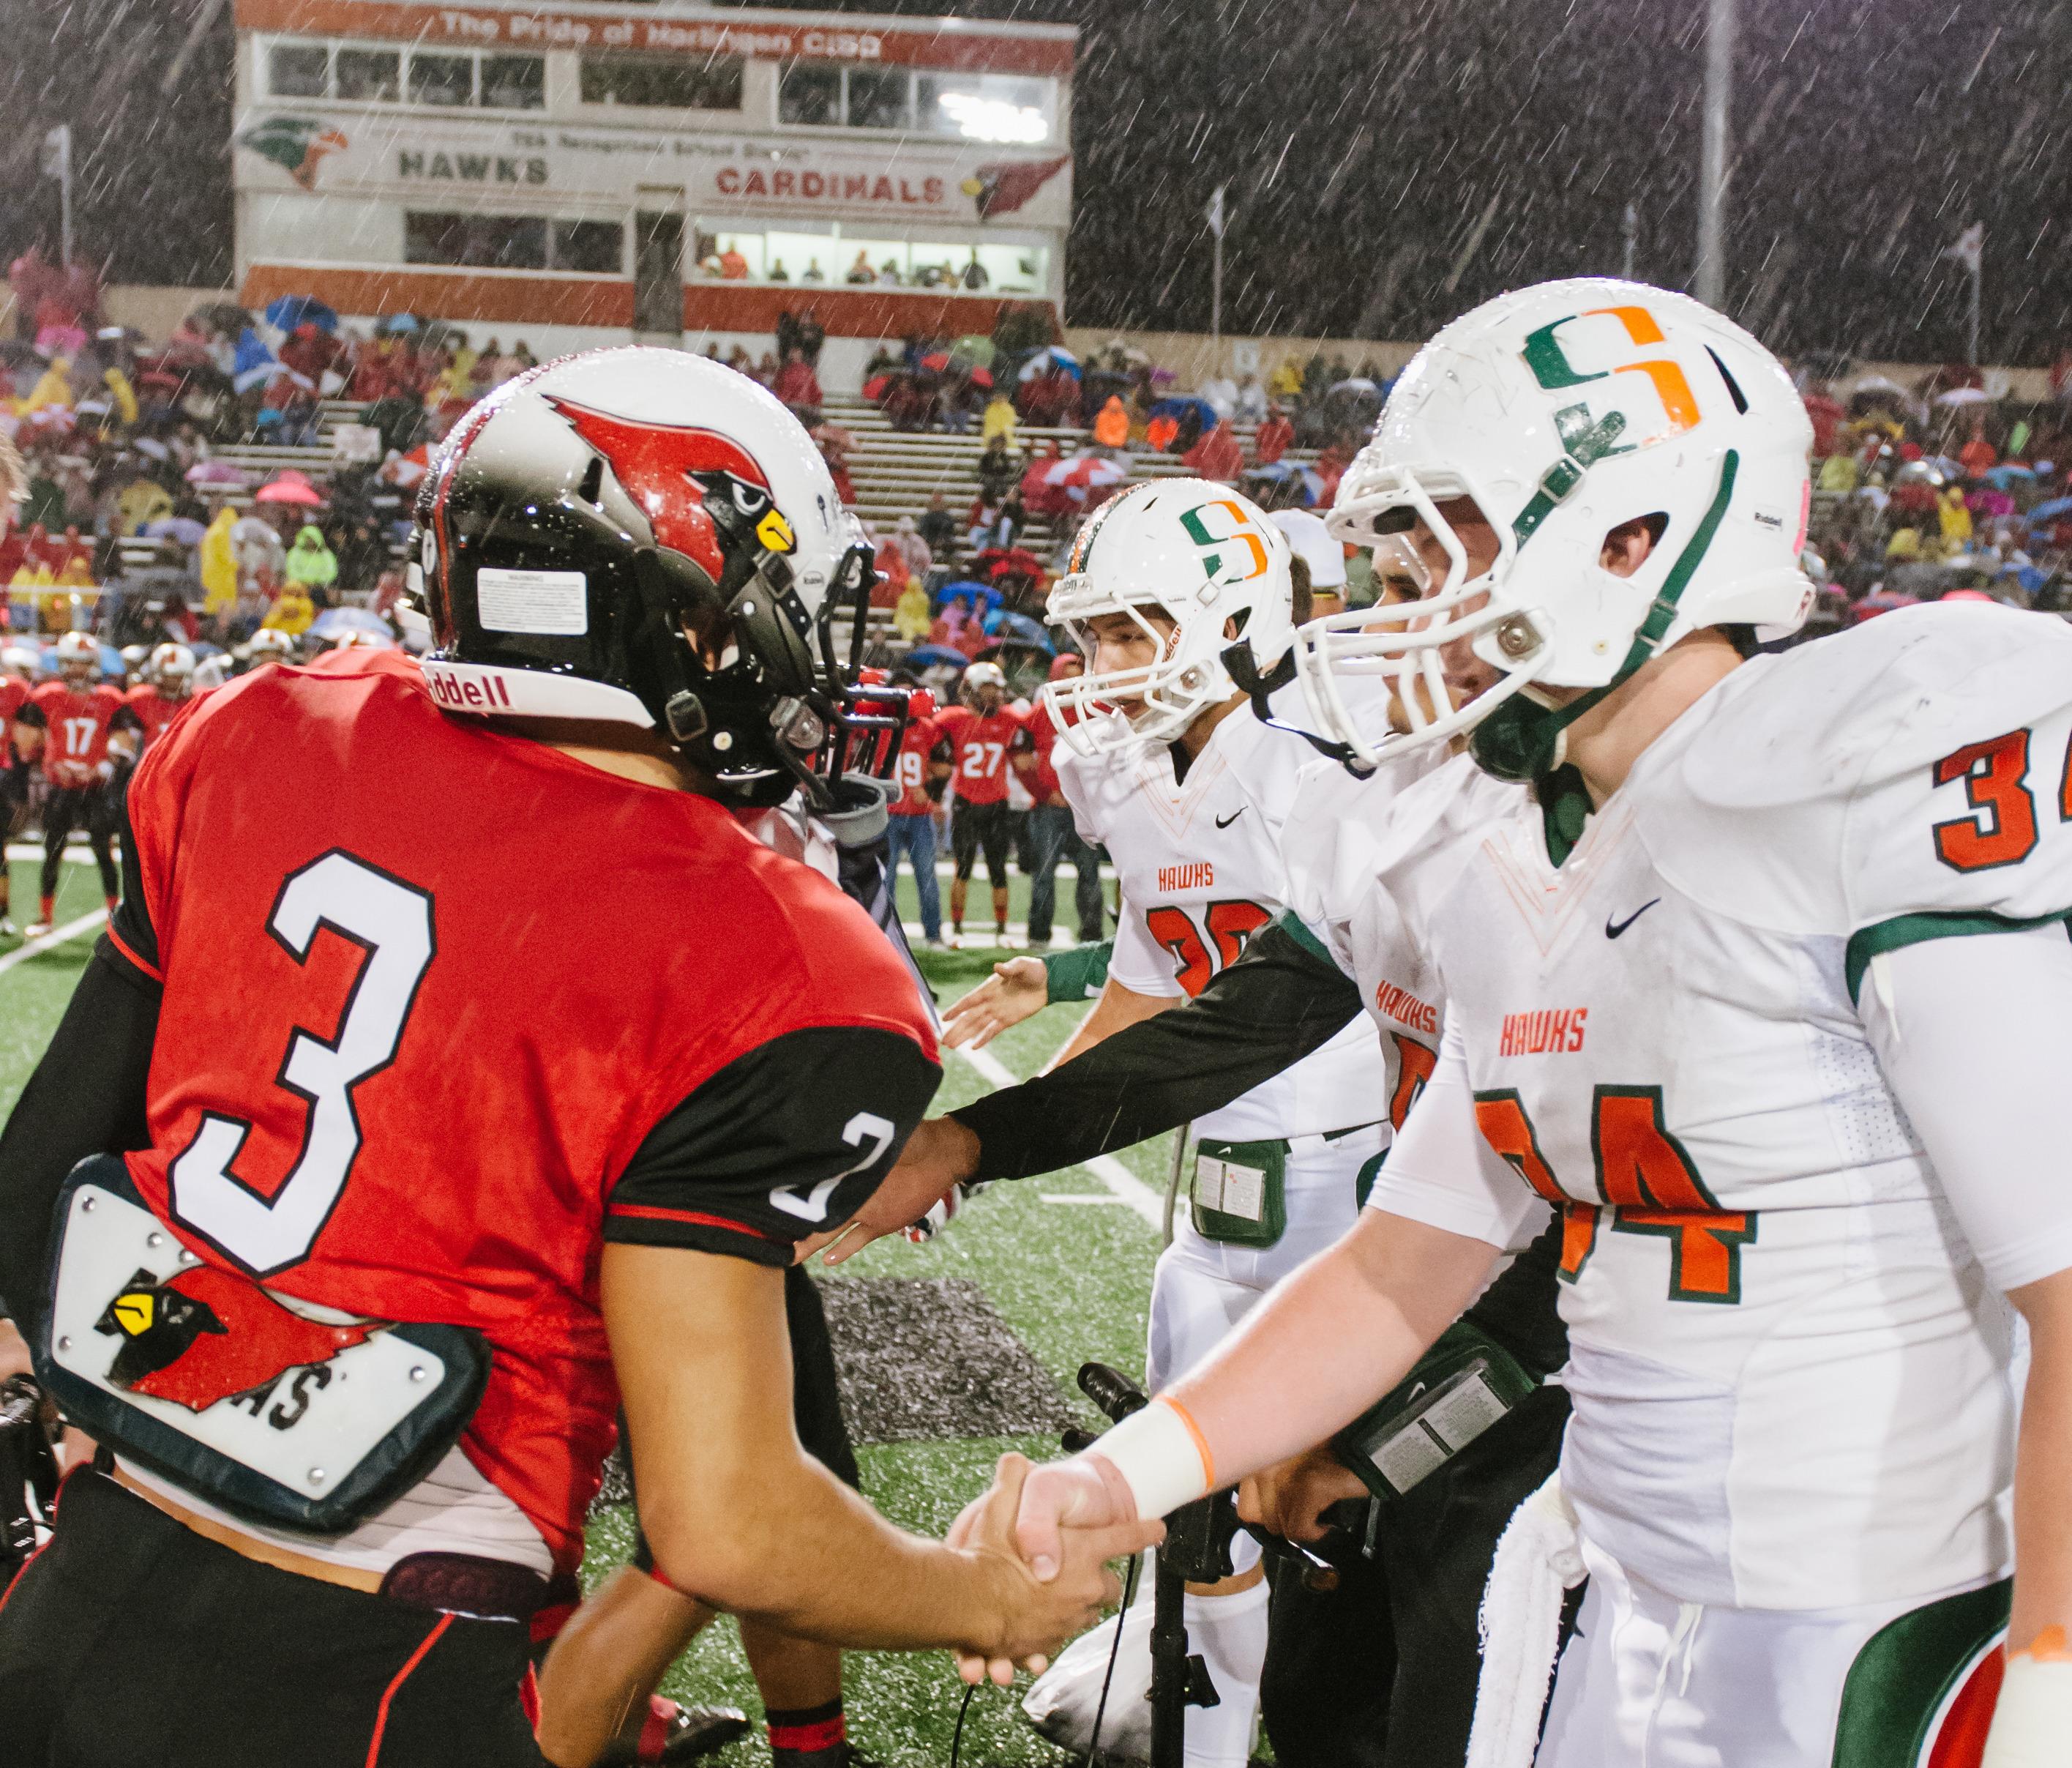 Football fans unite for Bird Bowl XXIII